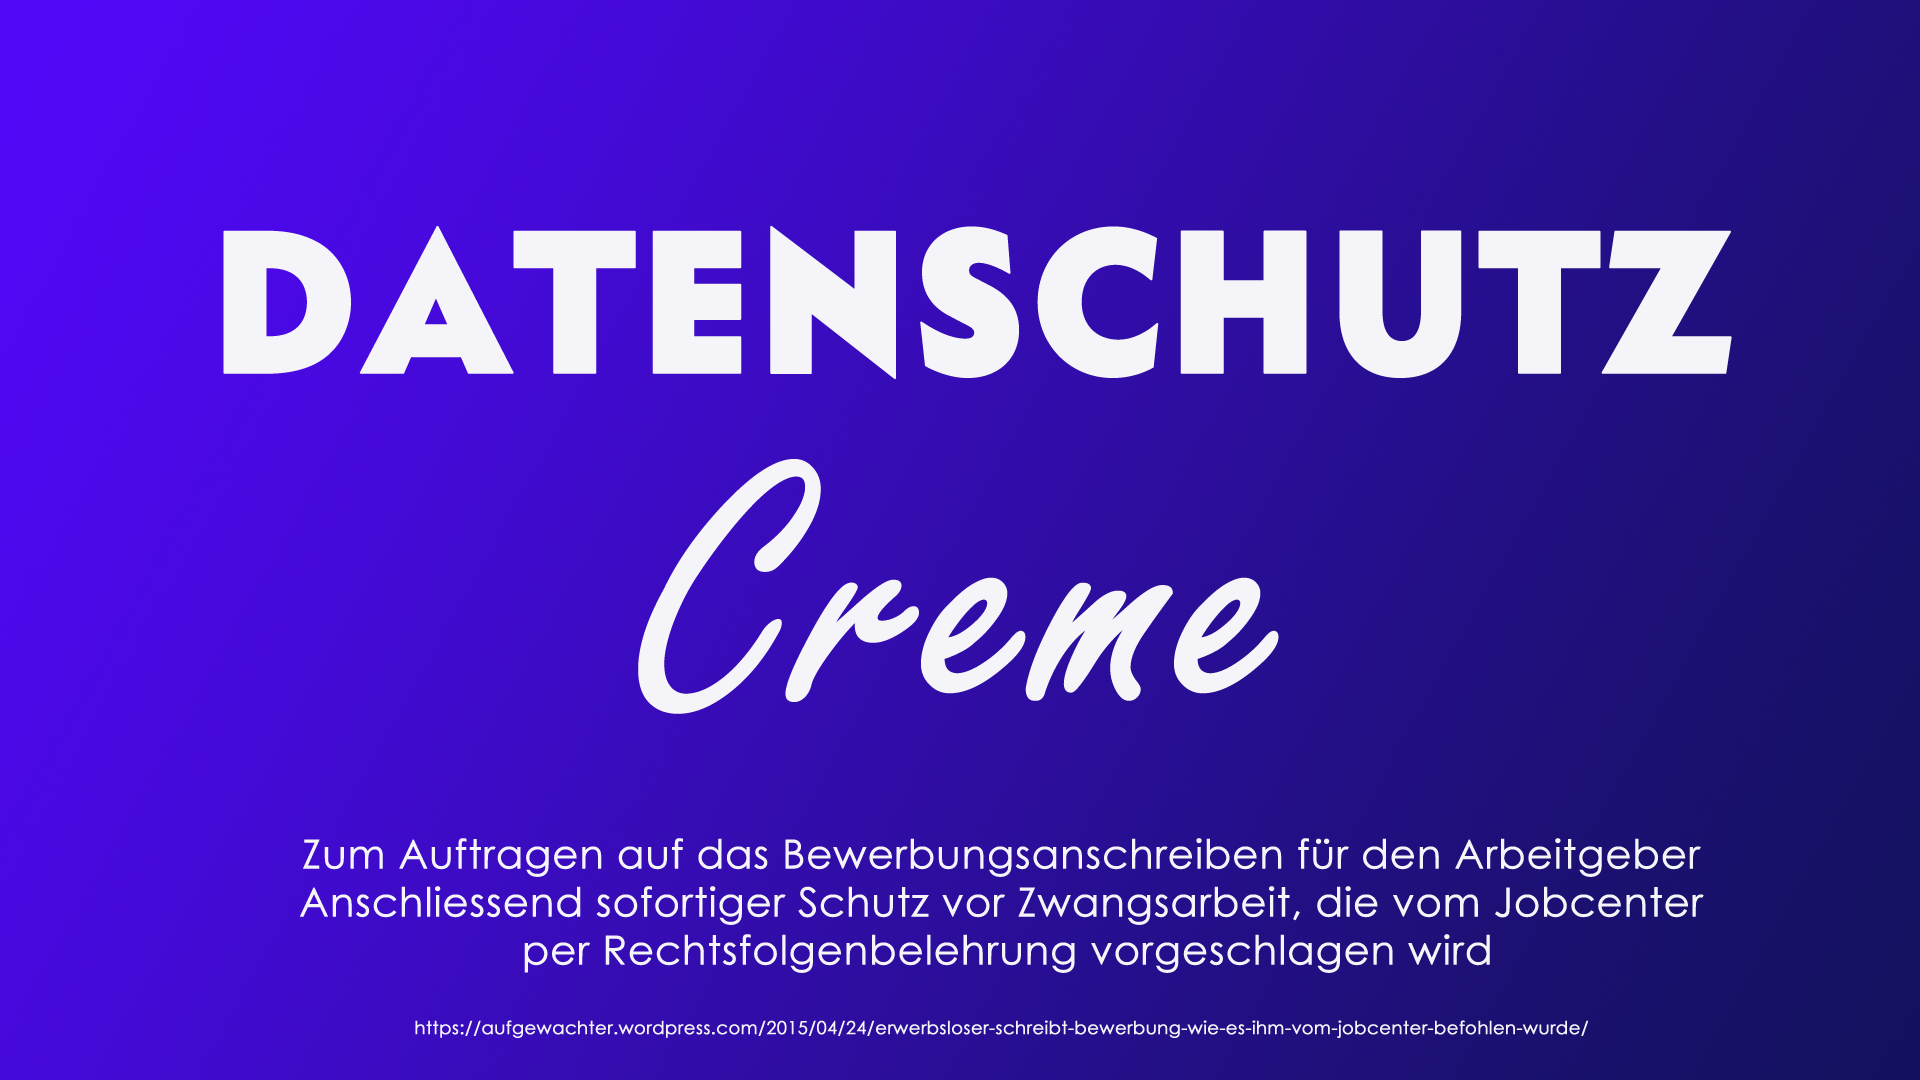 DATENSCHUTZ-Crème